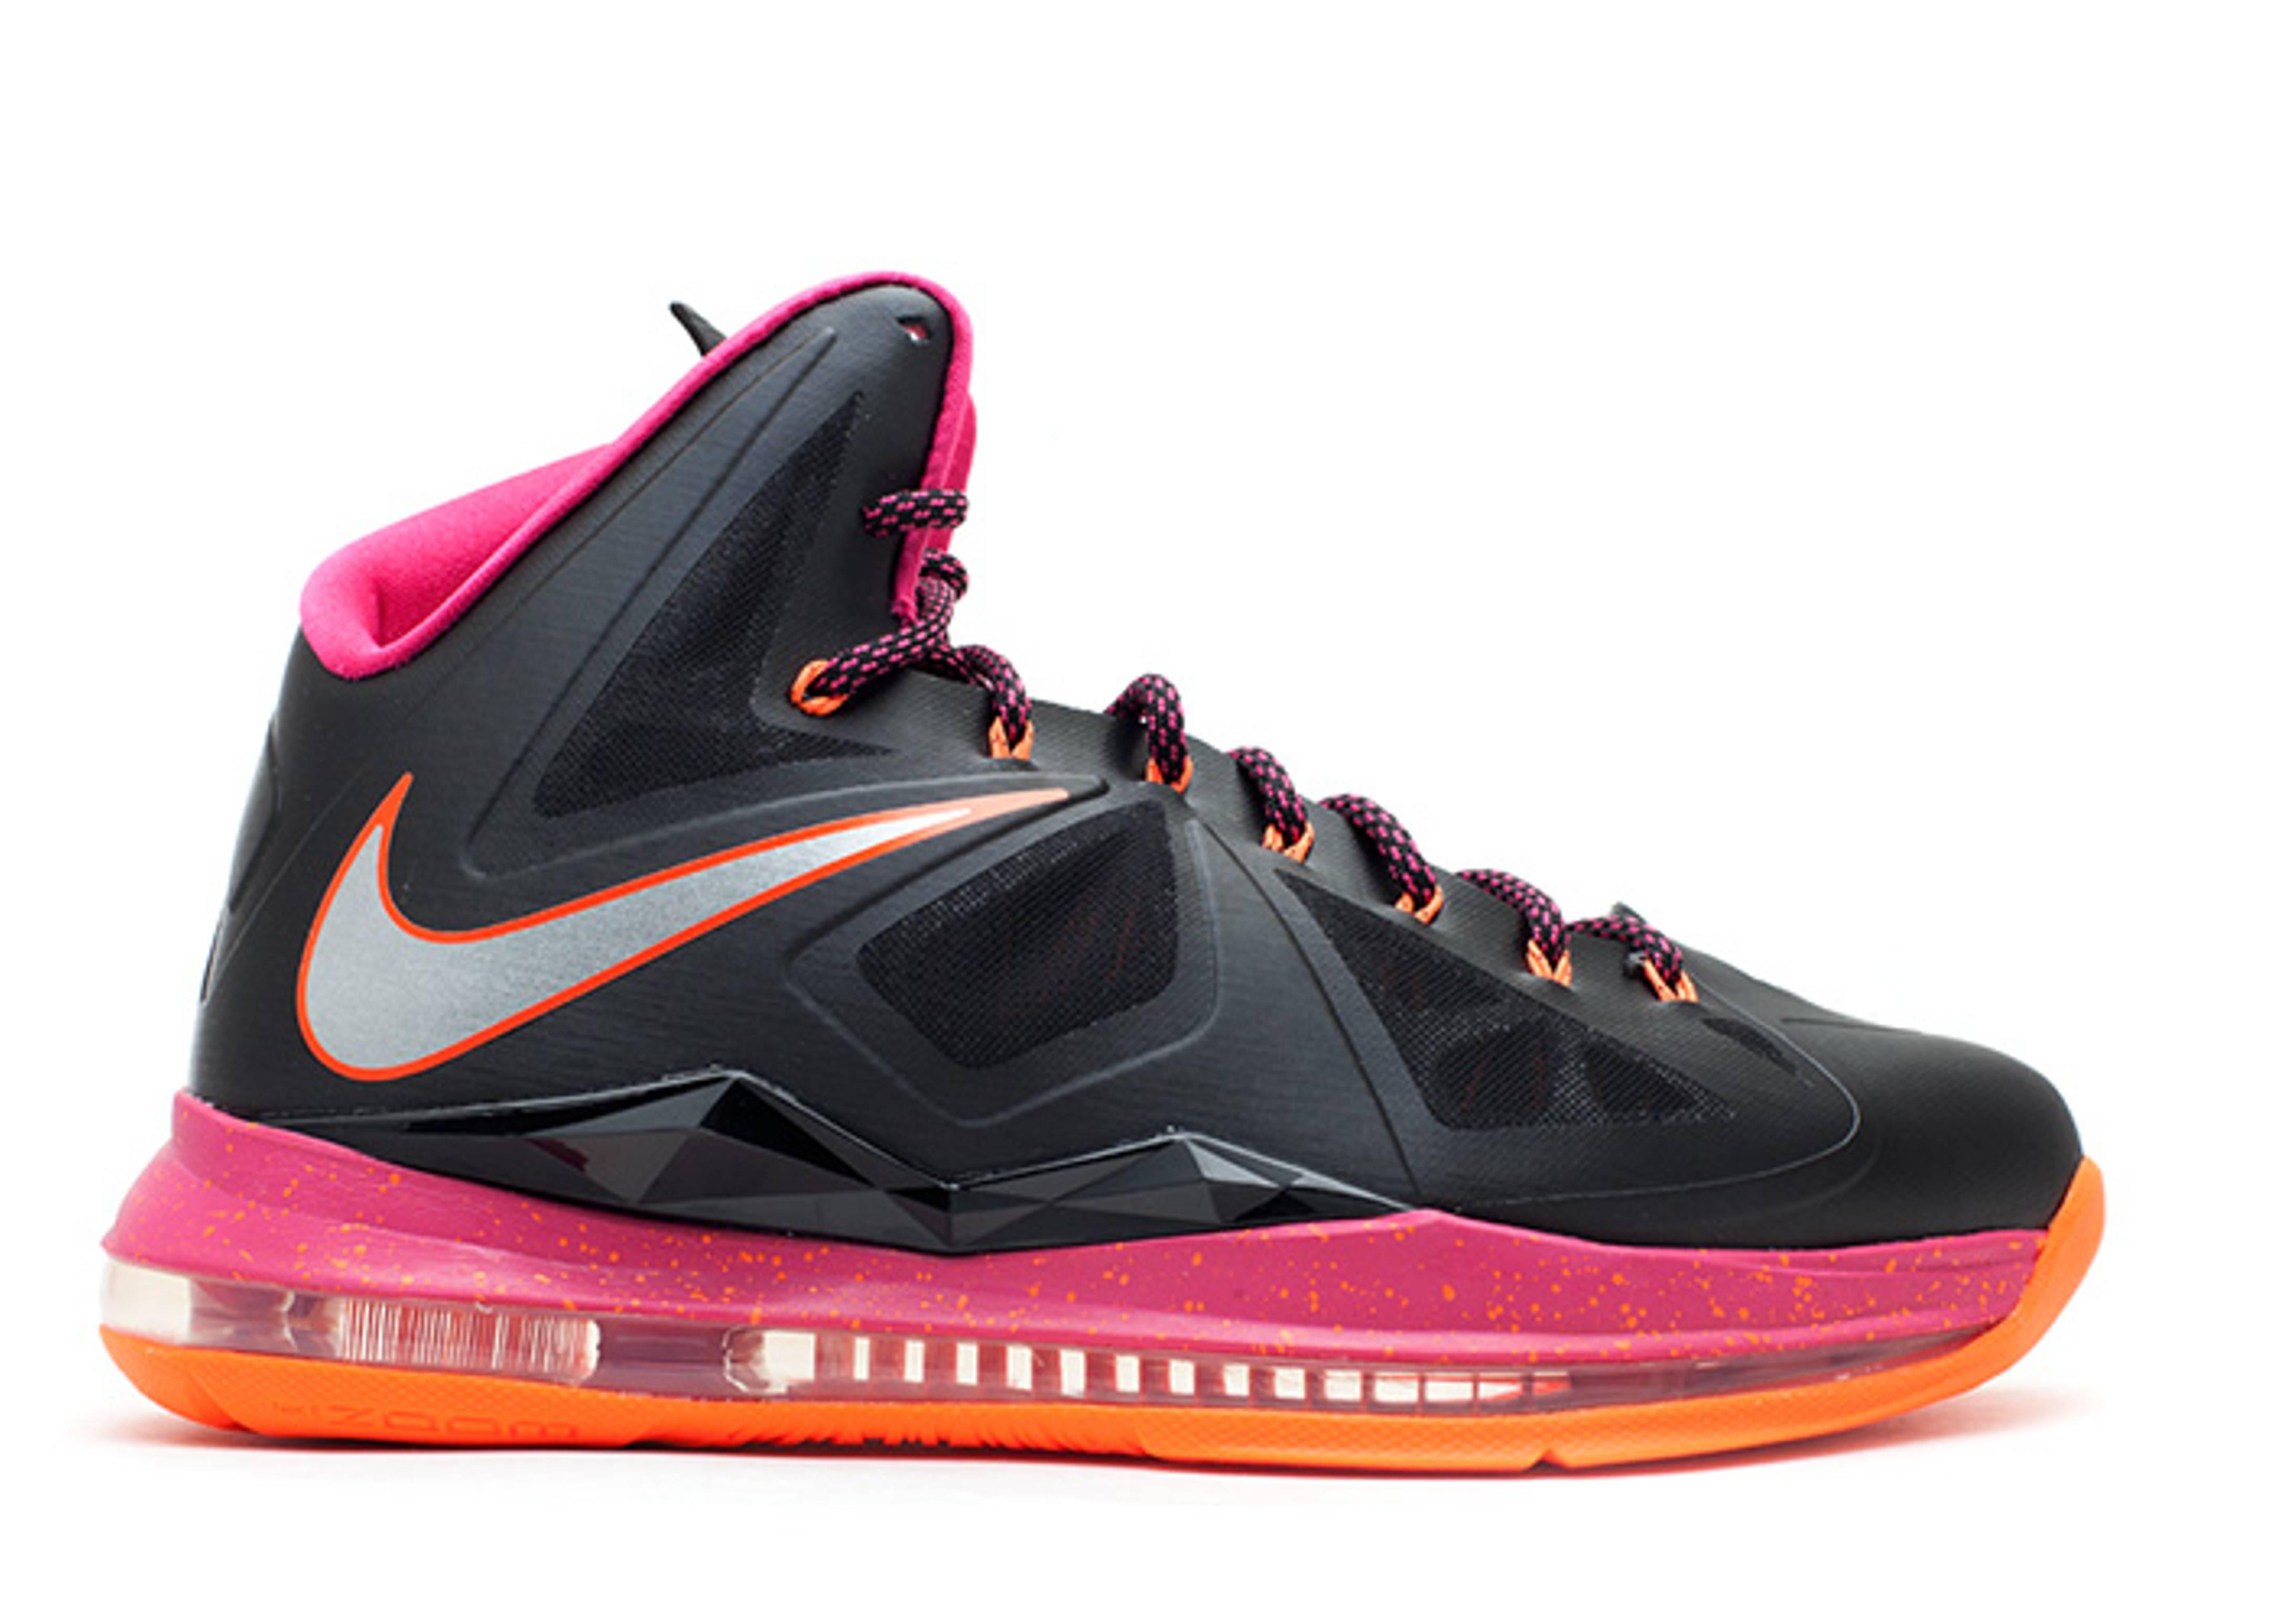 Nike LeBron X Floridian Sneakers (Black/Metallic Silver-Total Orange-Fireberry)